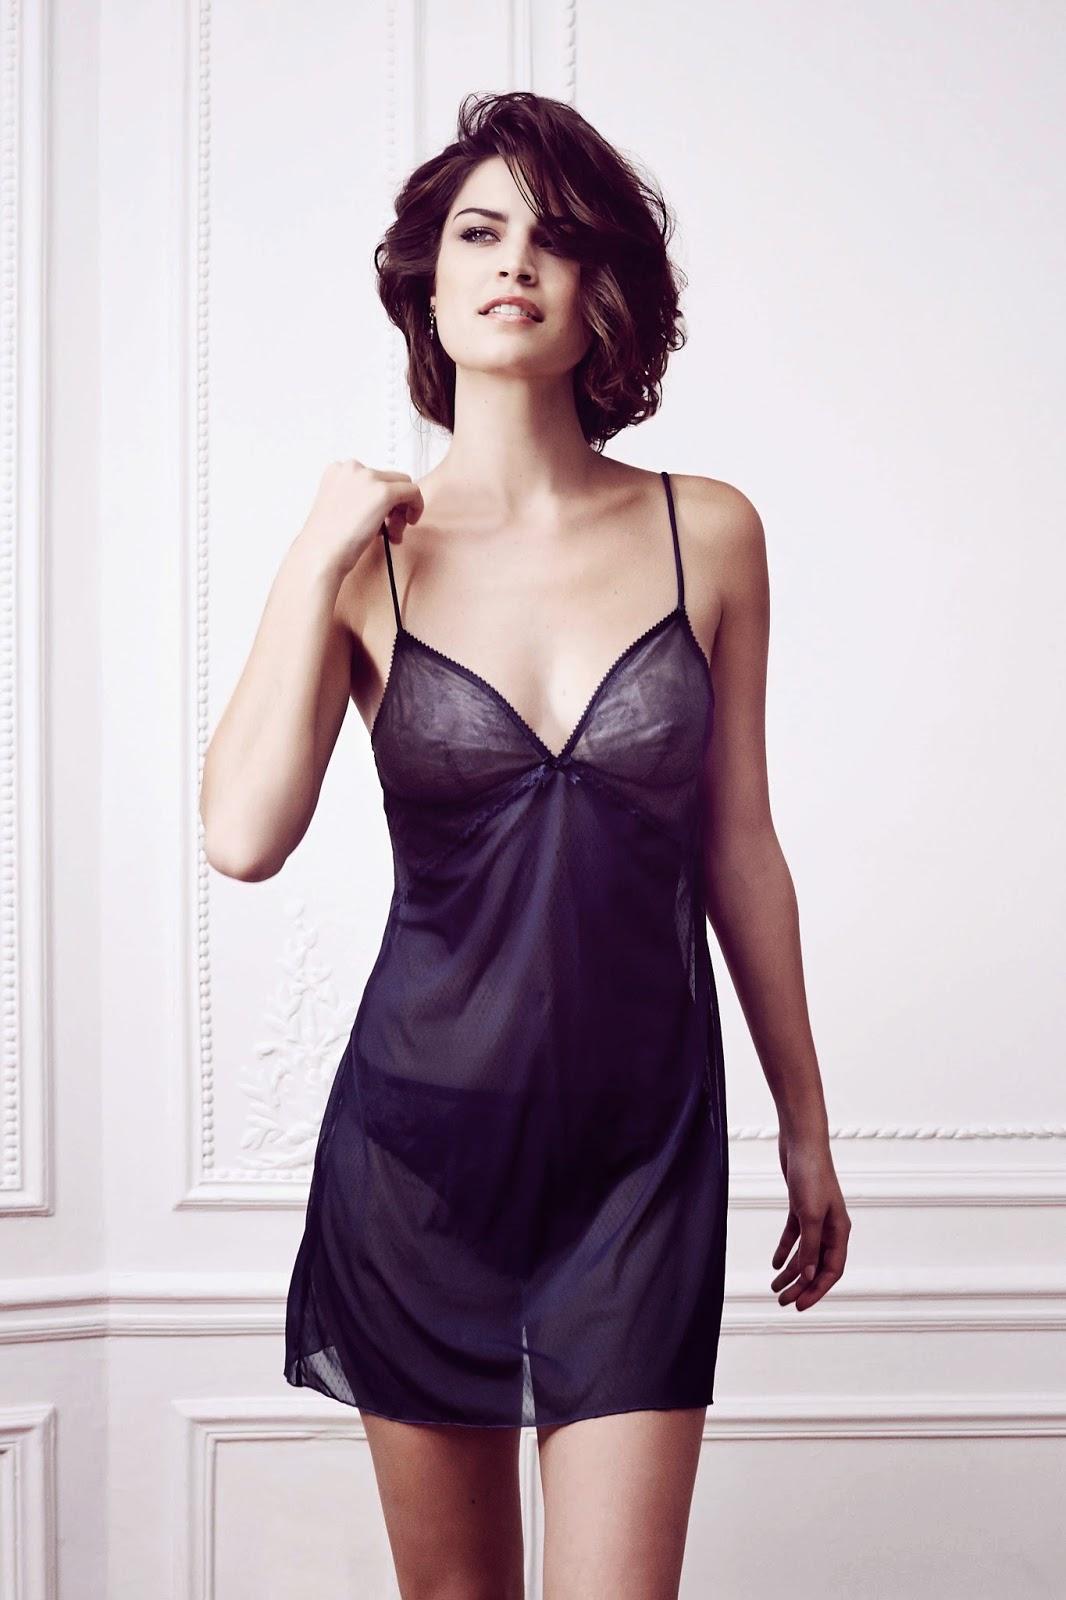 vanity fair lingerie d barque en france madame r ve paris. Black Bedroom Furniture Sets. Home Design Ideas